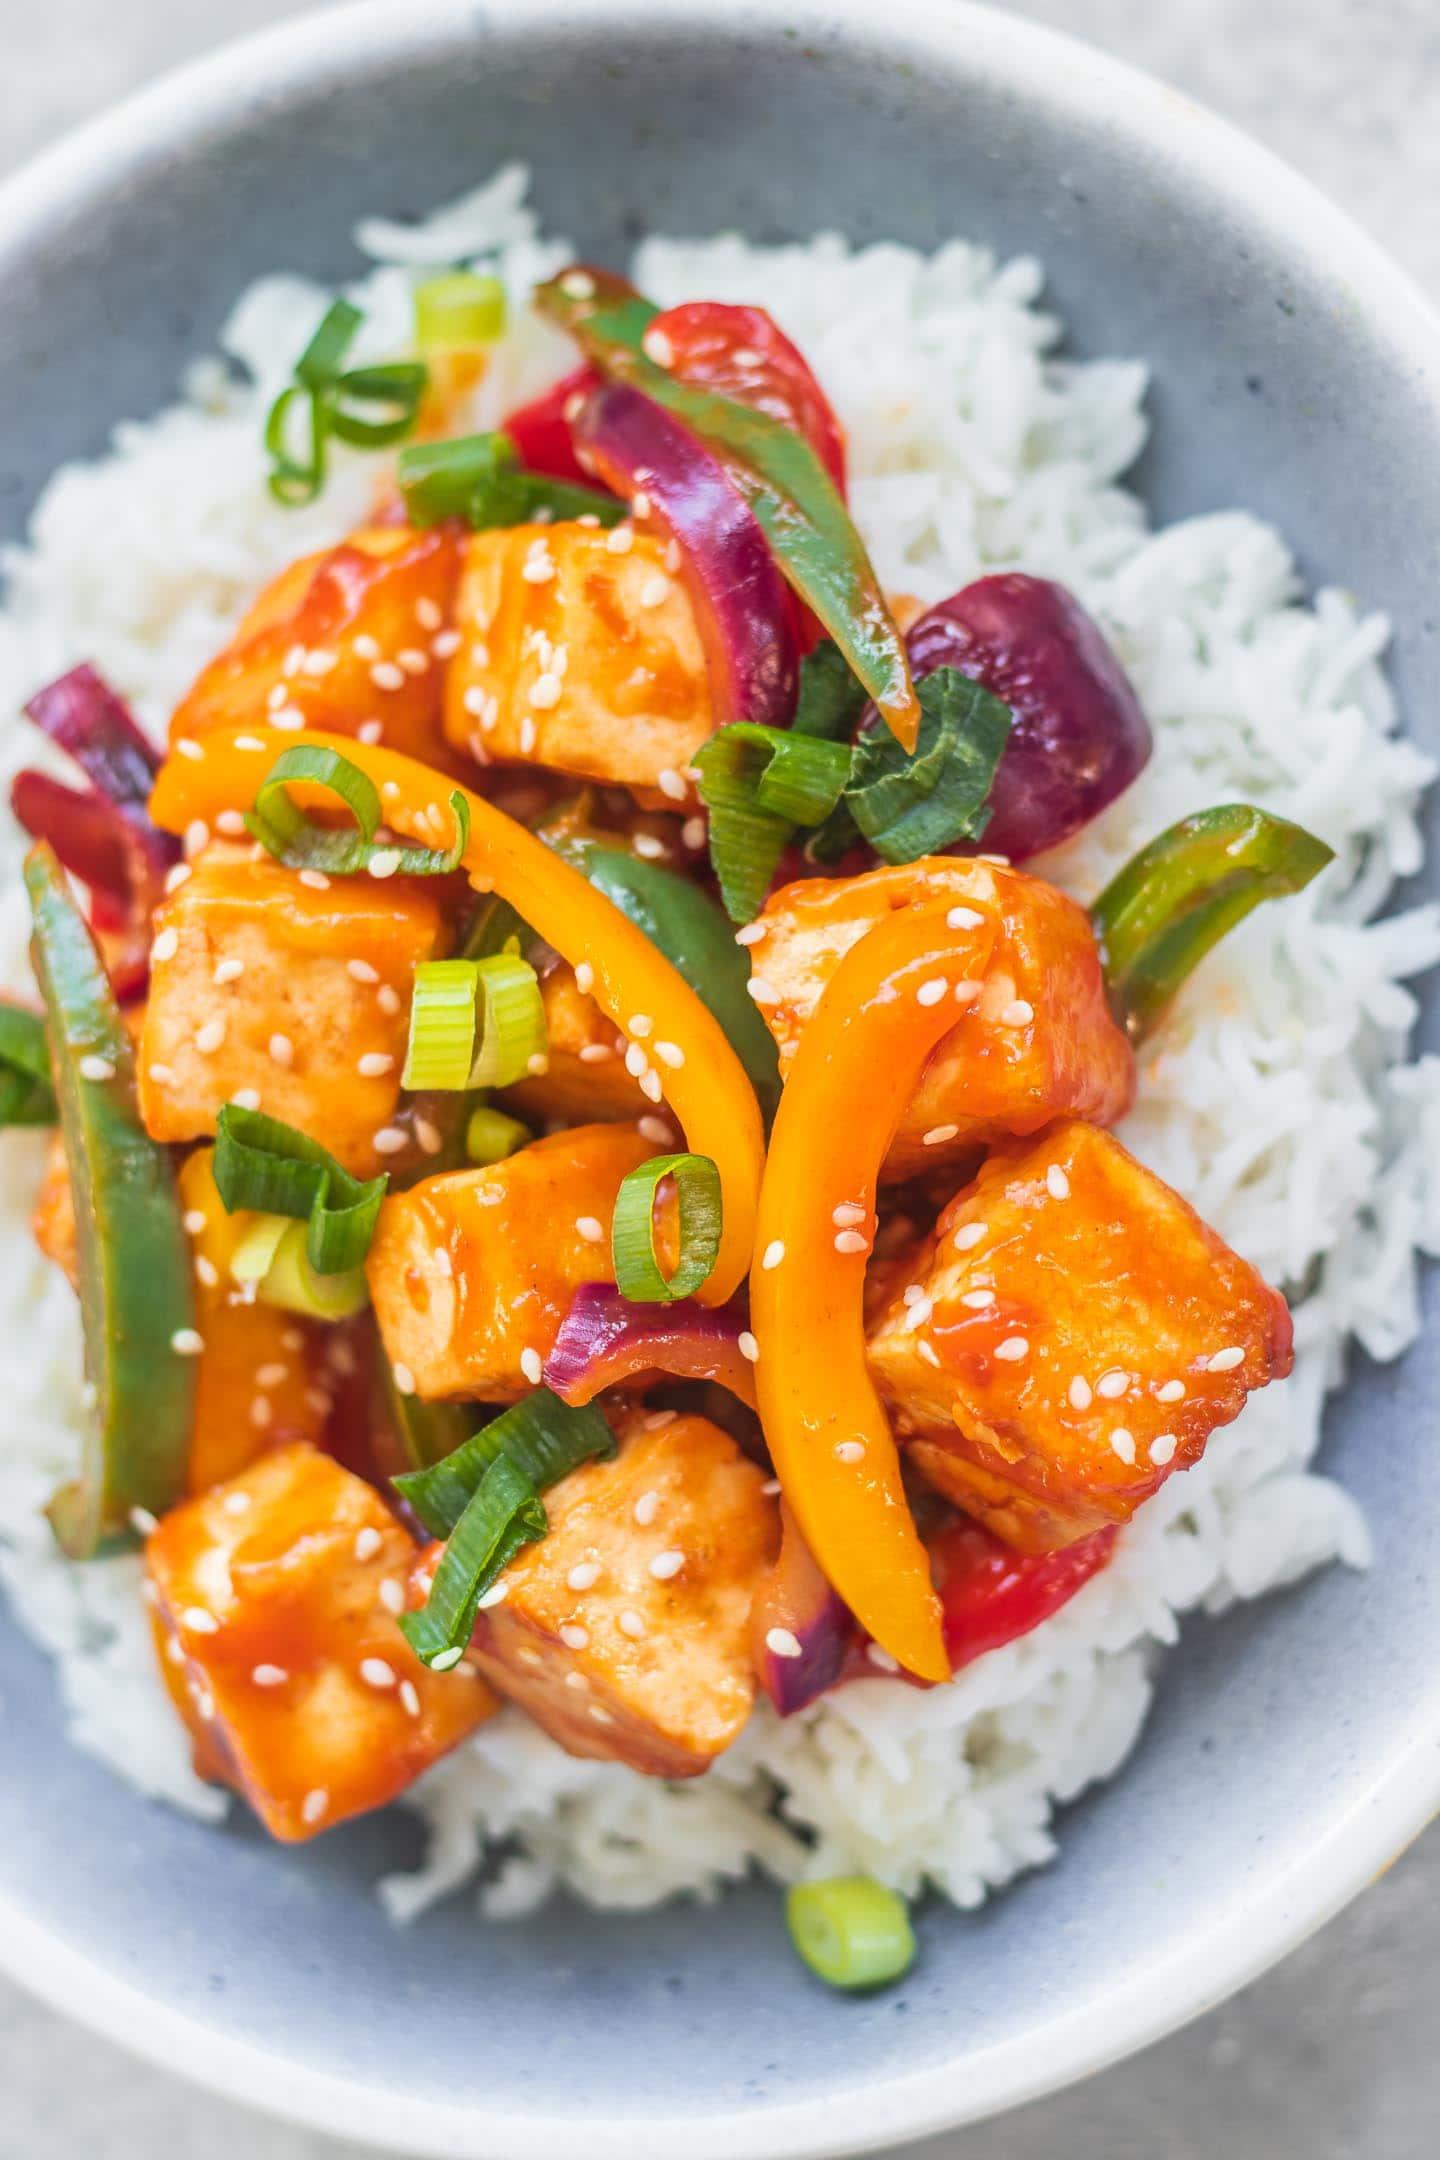 Sweet and sour tofu vegan gluten-free